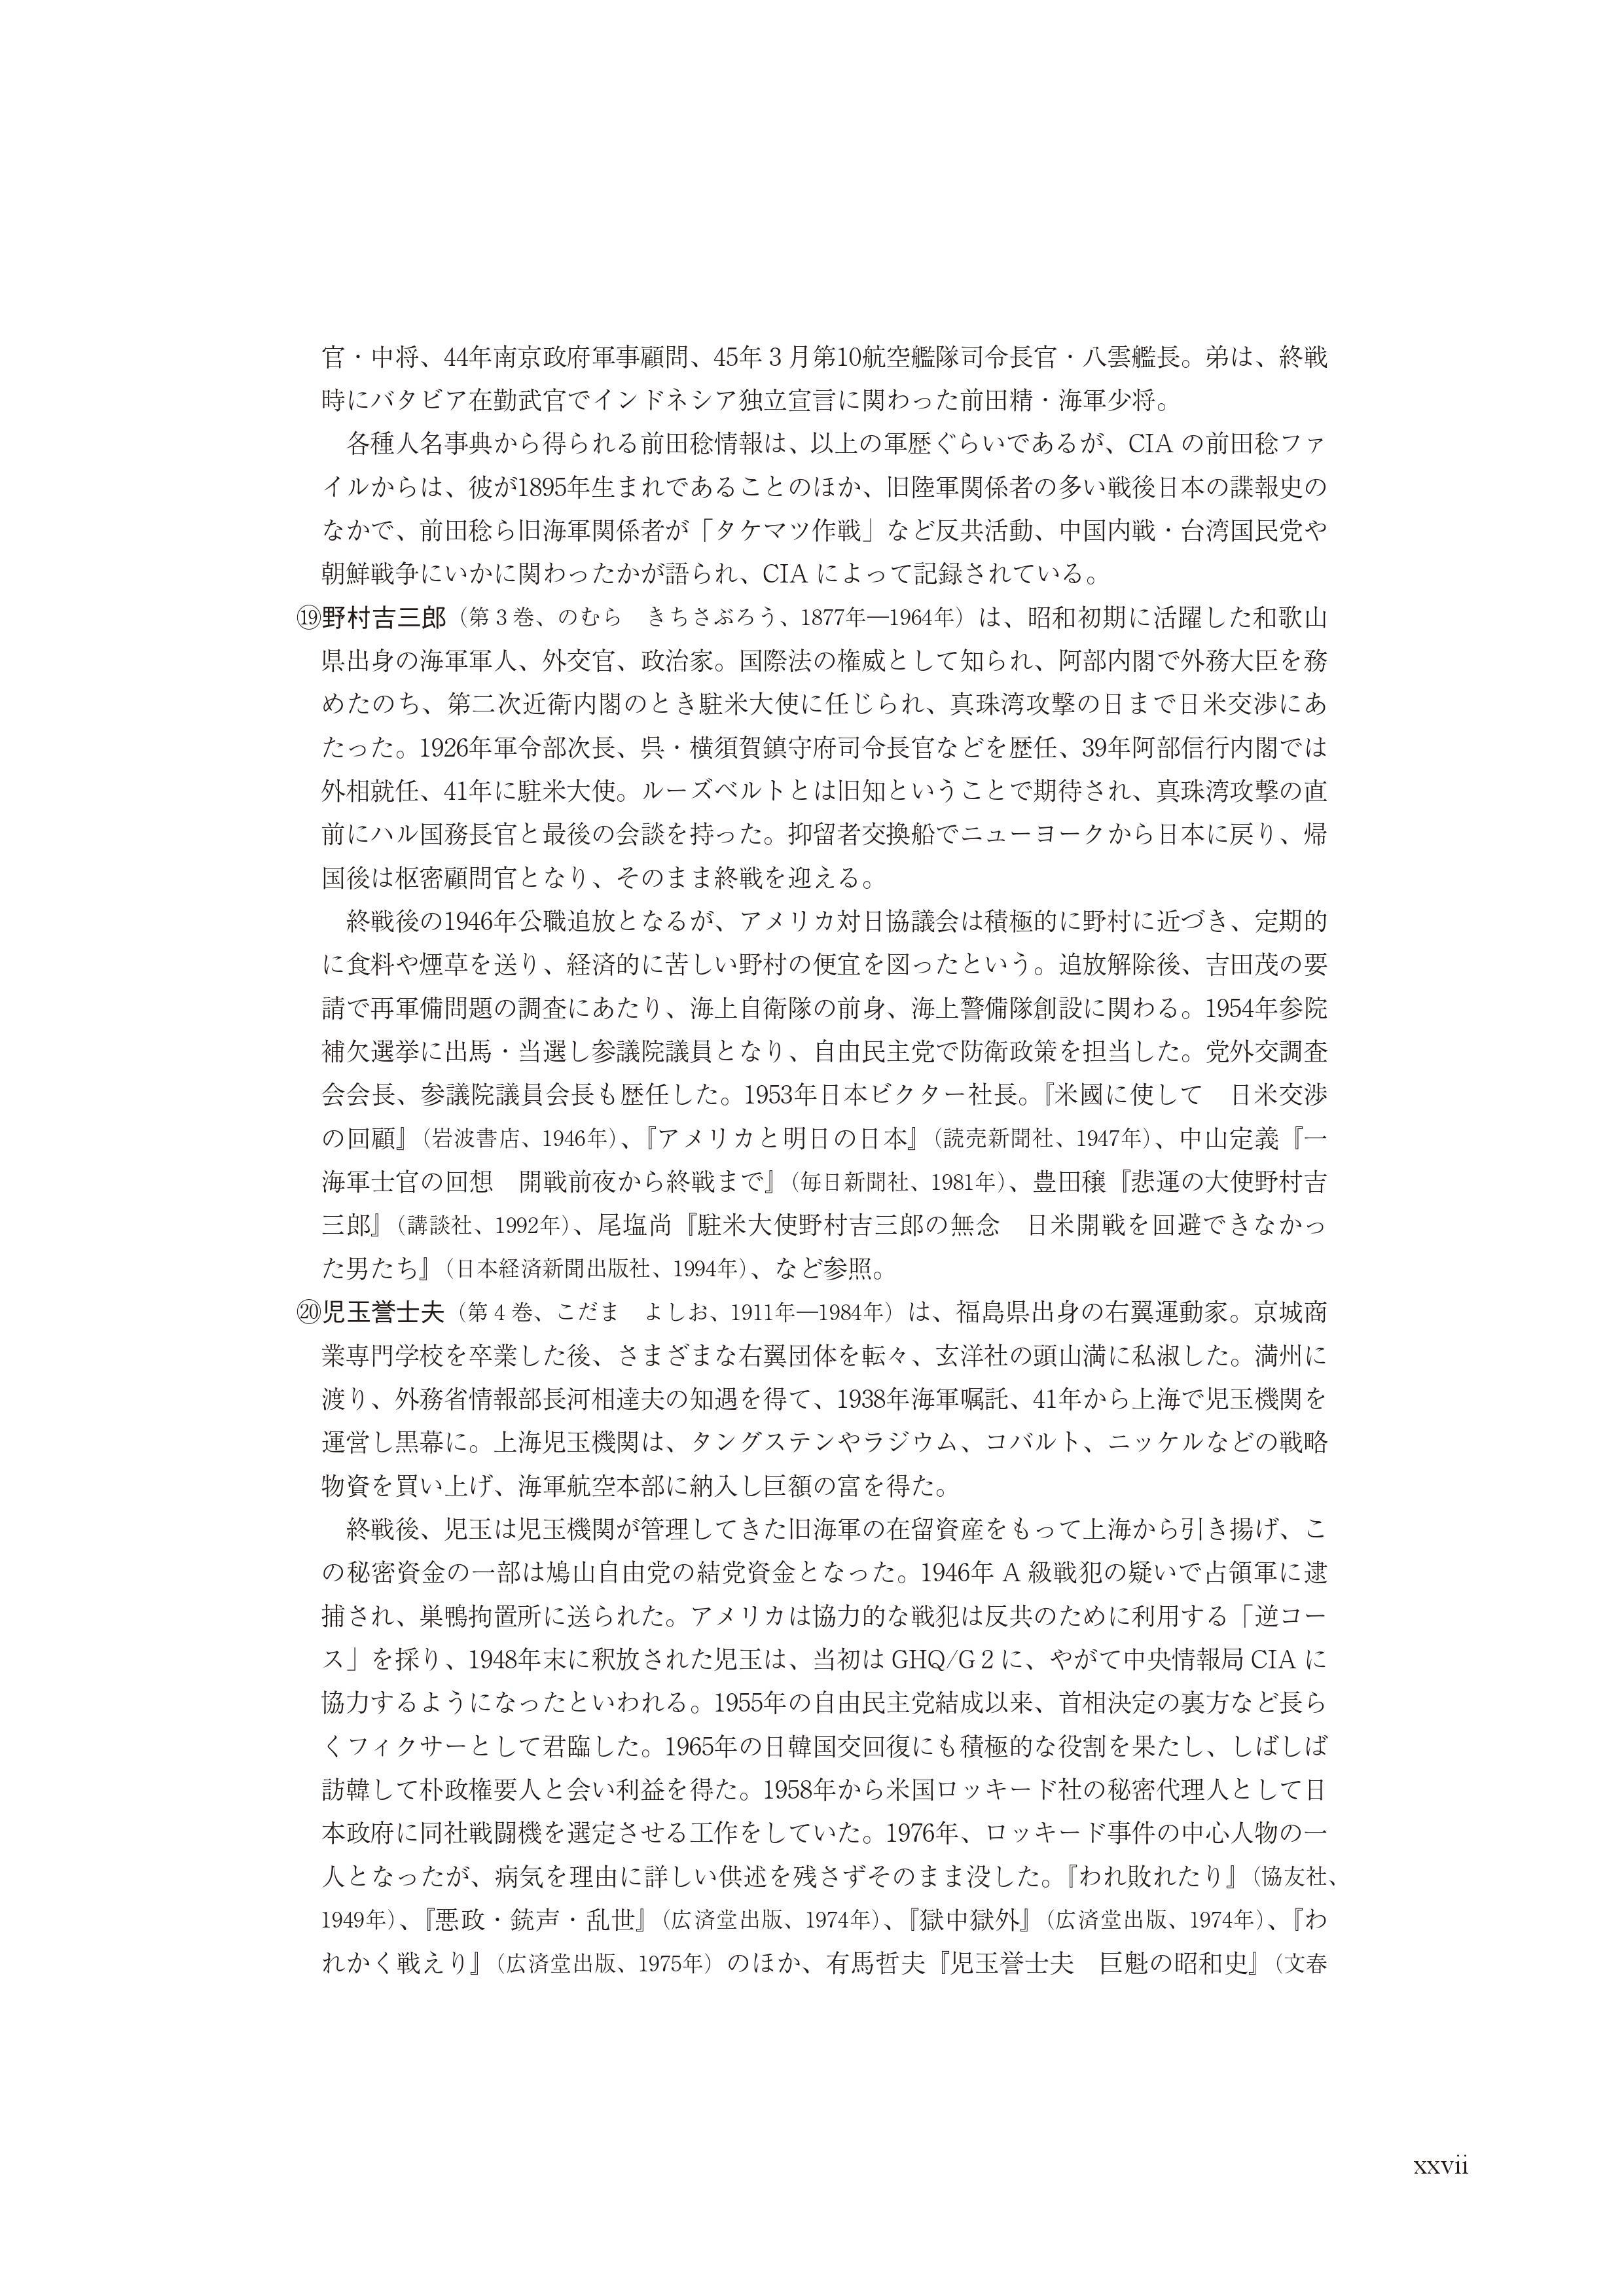 CIA日本人ファイル0001 (27)